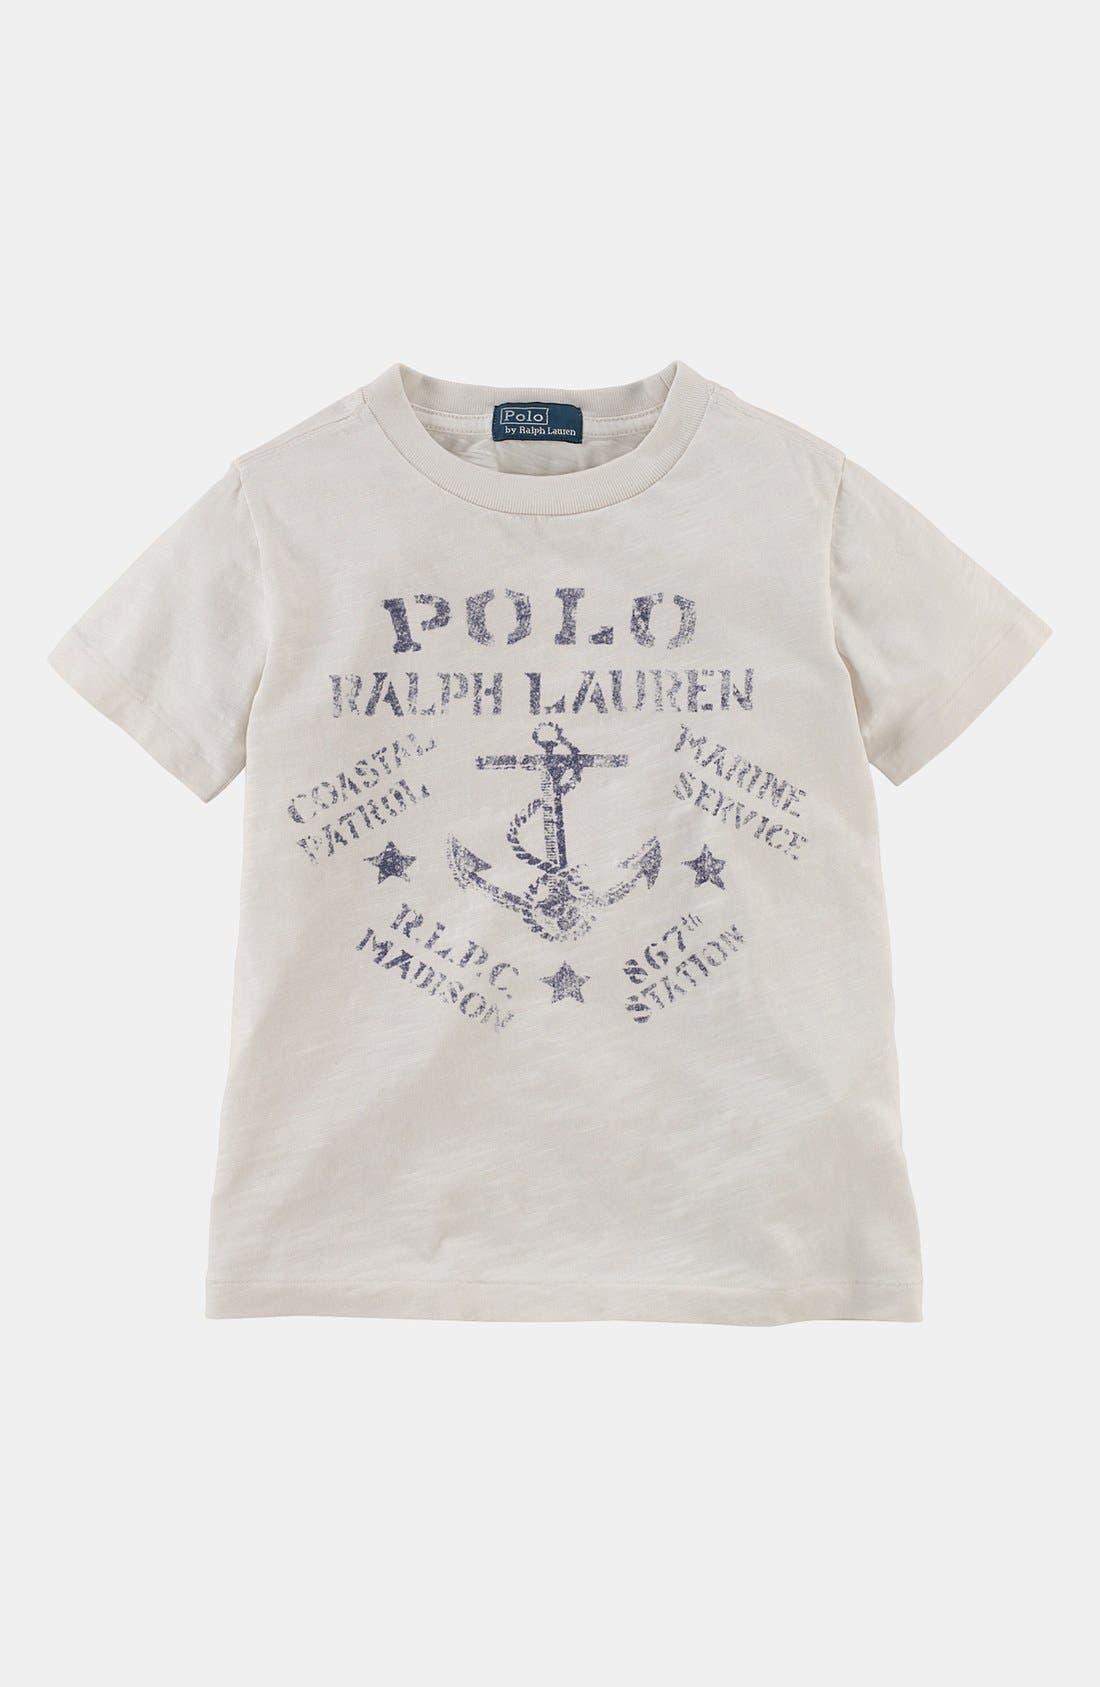 Alternate Image 1 Selected - Polo Ralph Lauren T-Shirt (Toddler Boys)